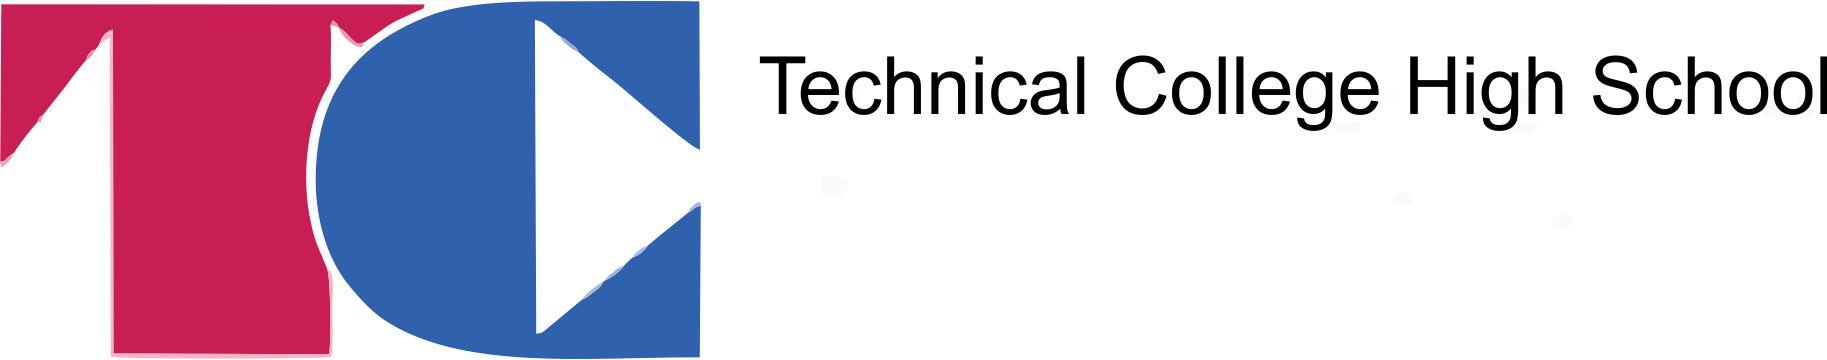 TCTEch203825.jpg